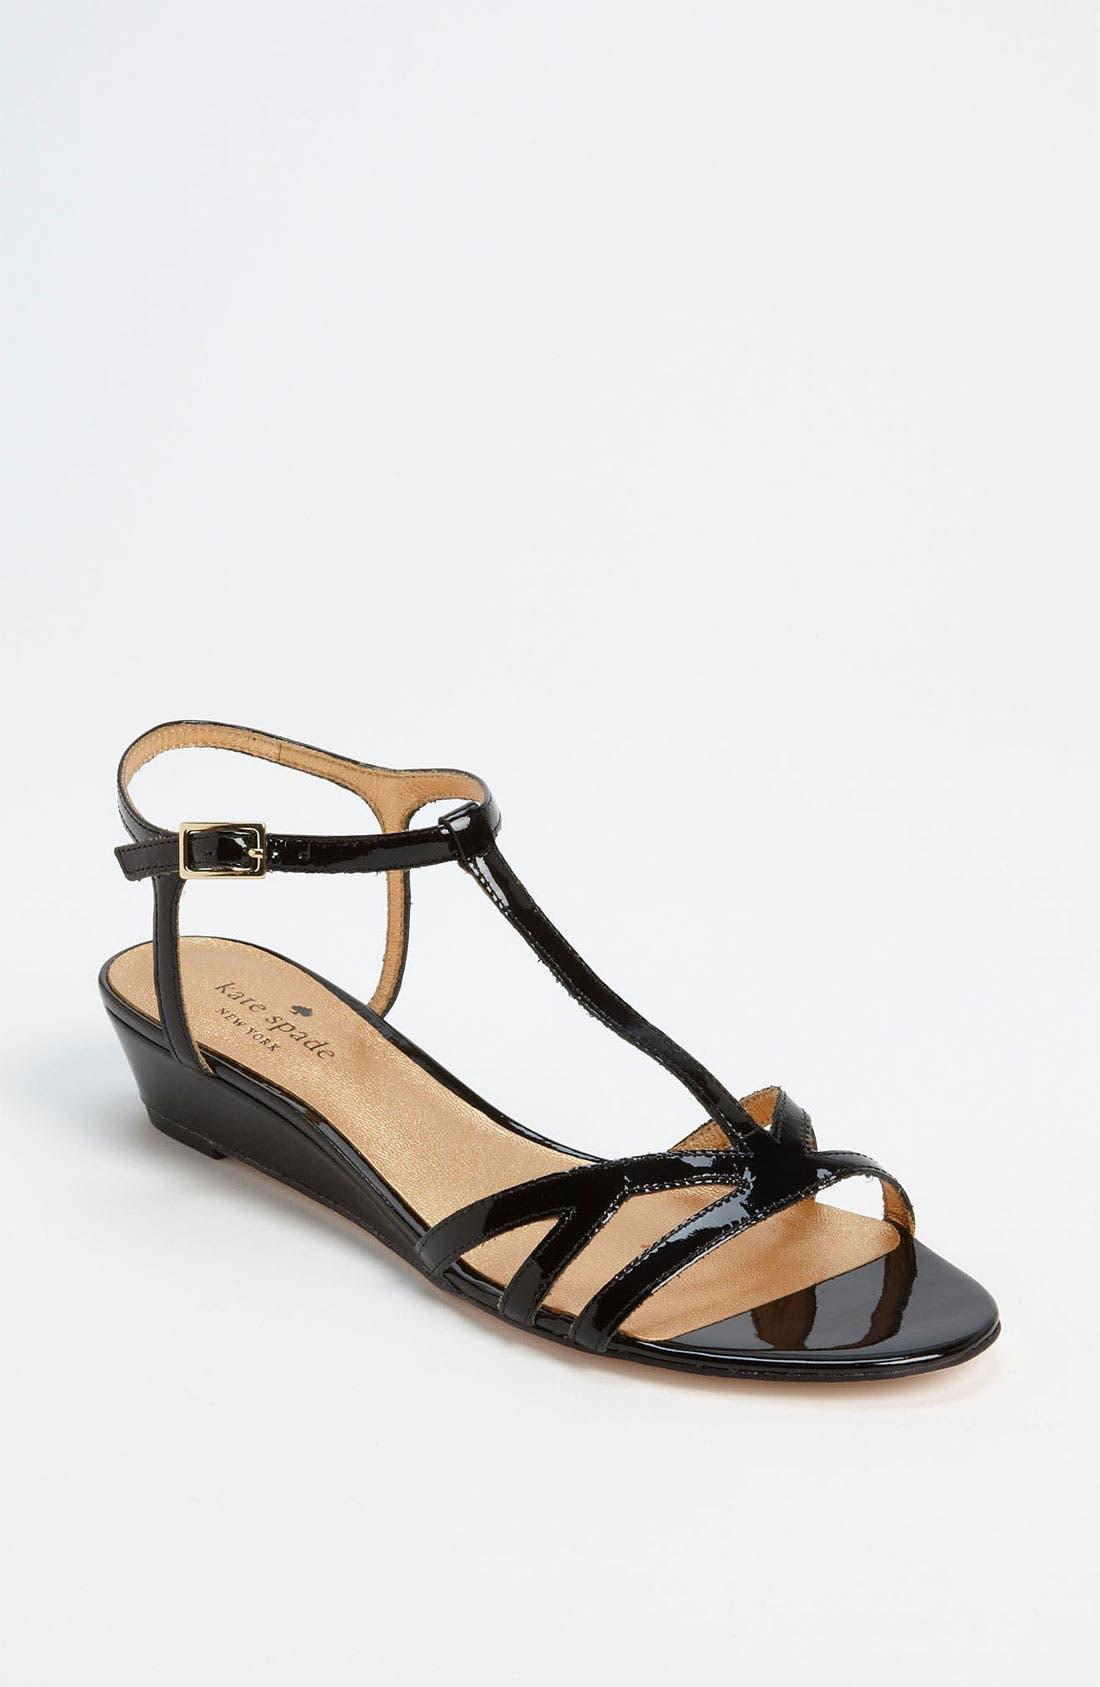 Main Image - kate spade new york 'violet' sandal